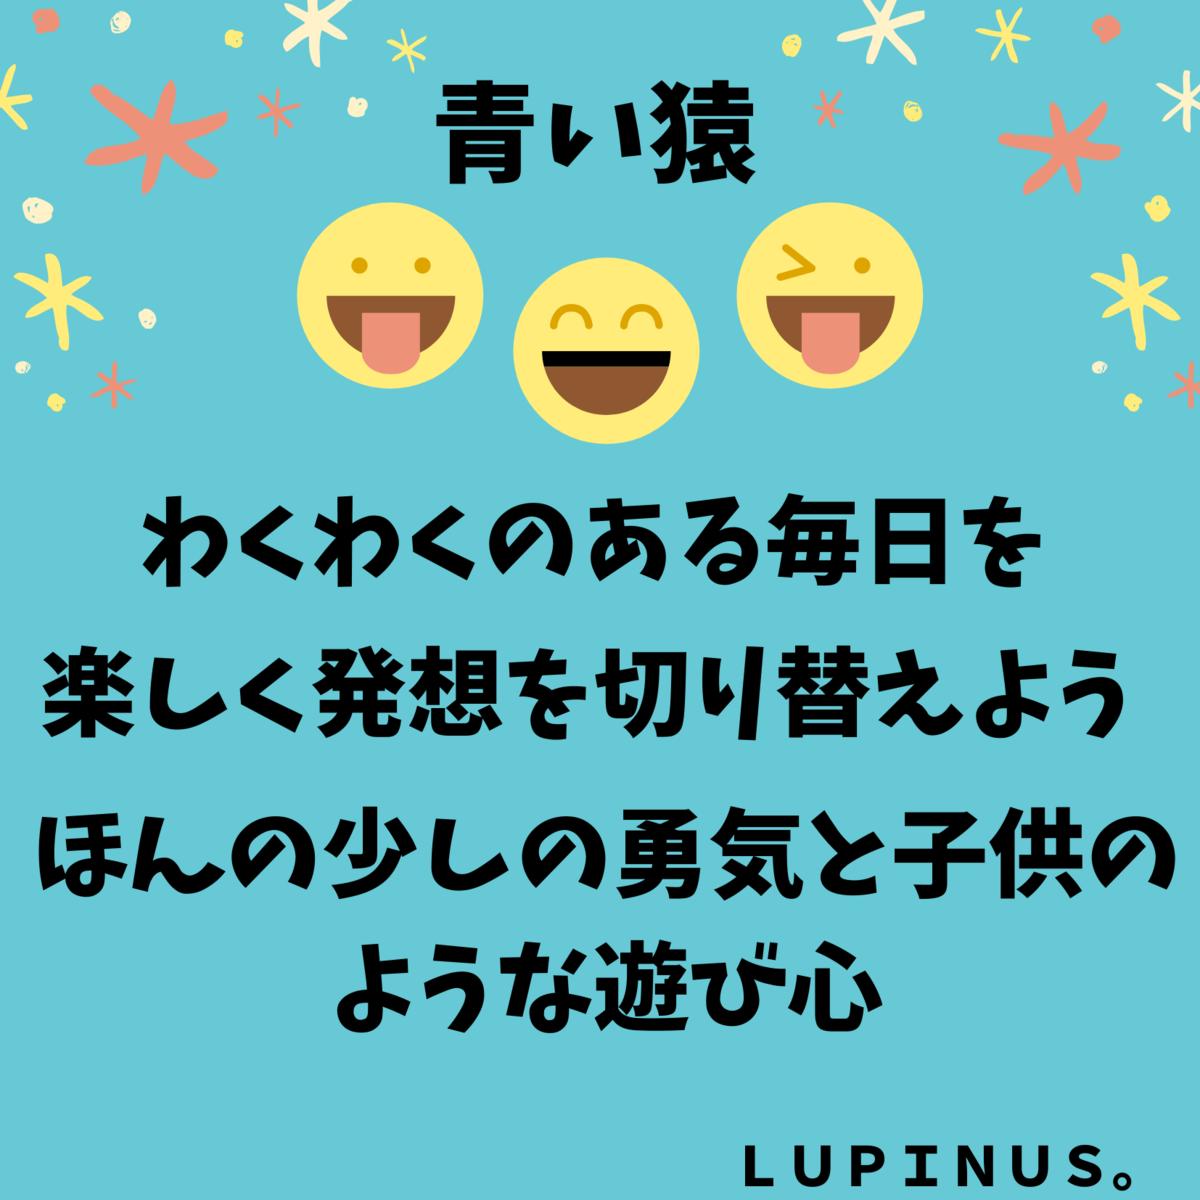 f:id:Lupinus104:20200805065327p:plain